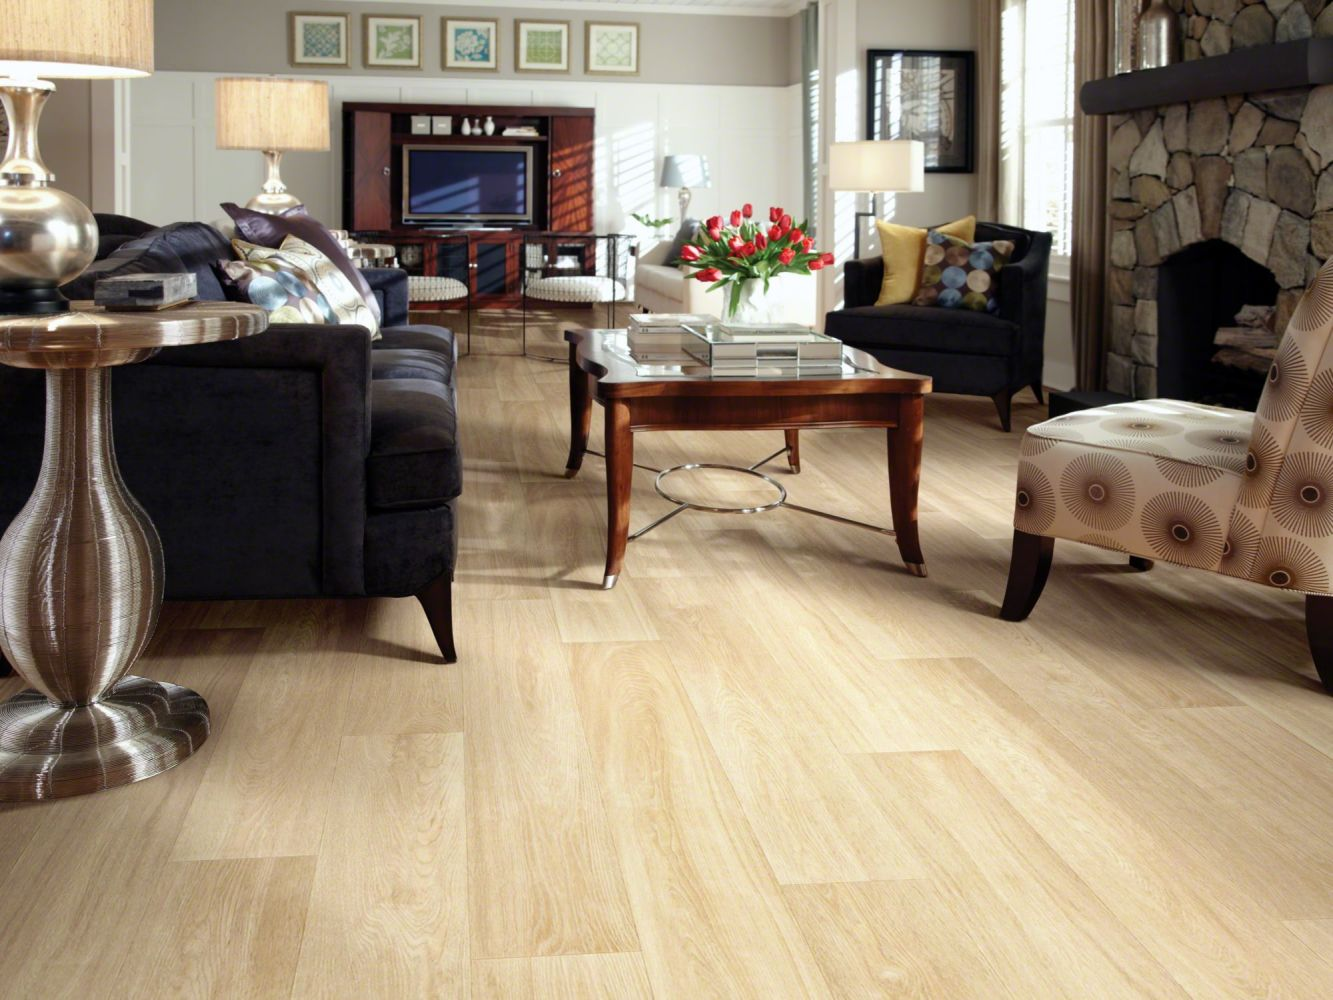 Shaw Floors Resilient Residential Argos Cythera 00229_0615V